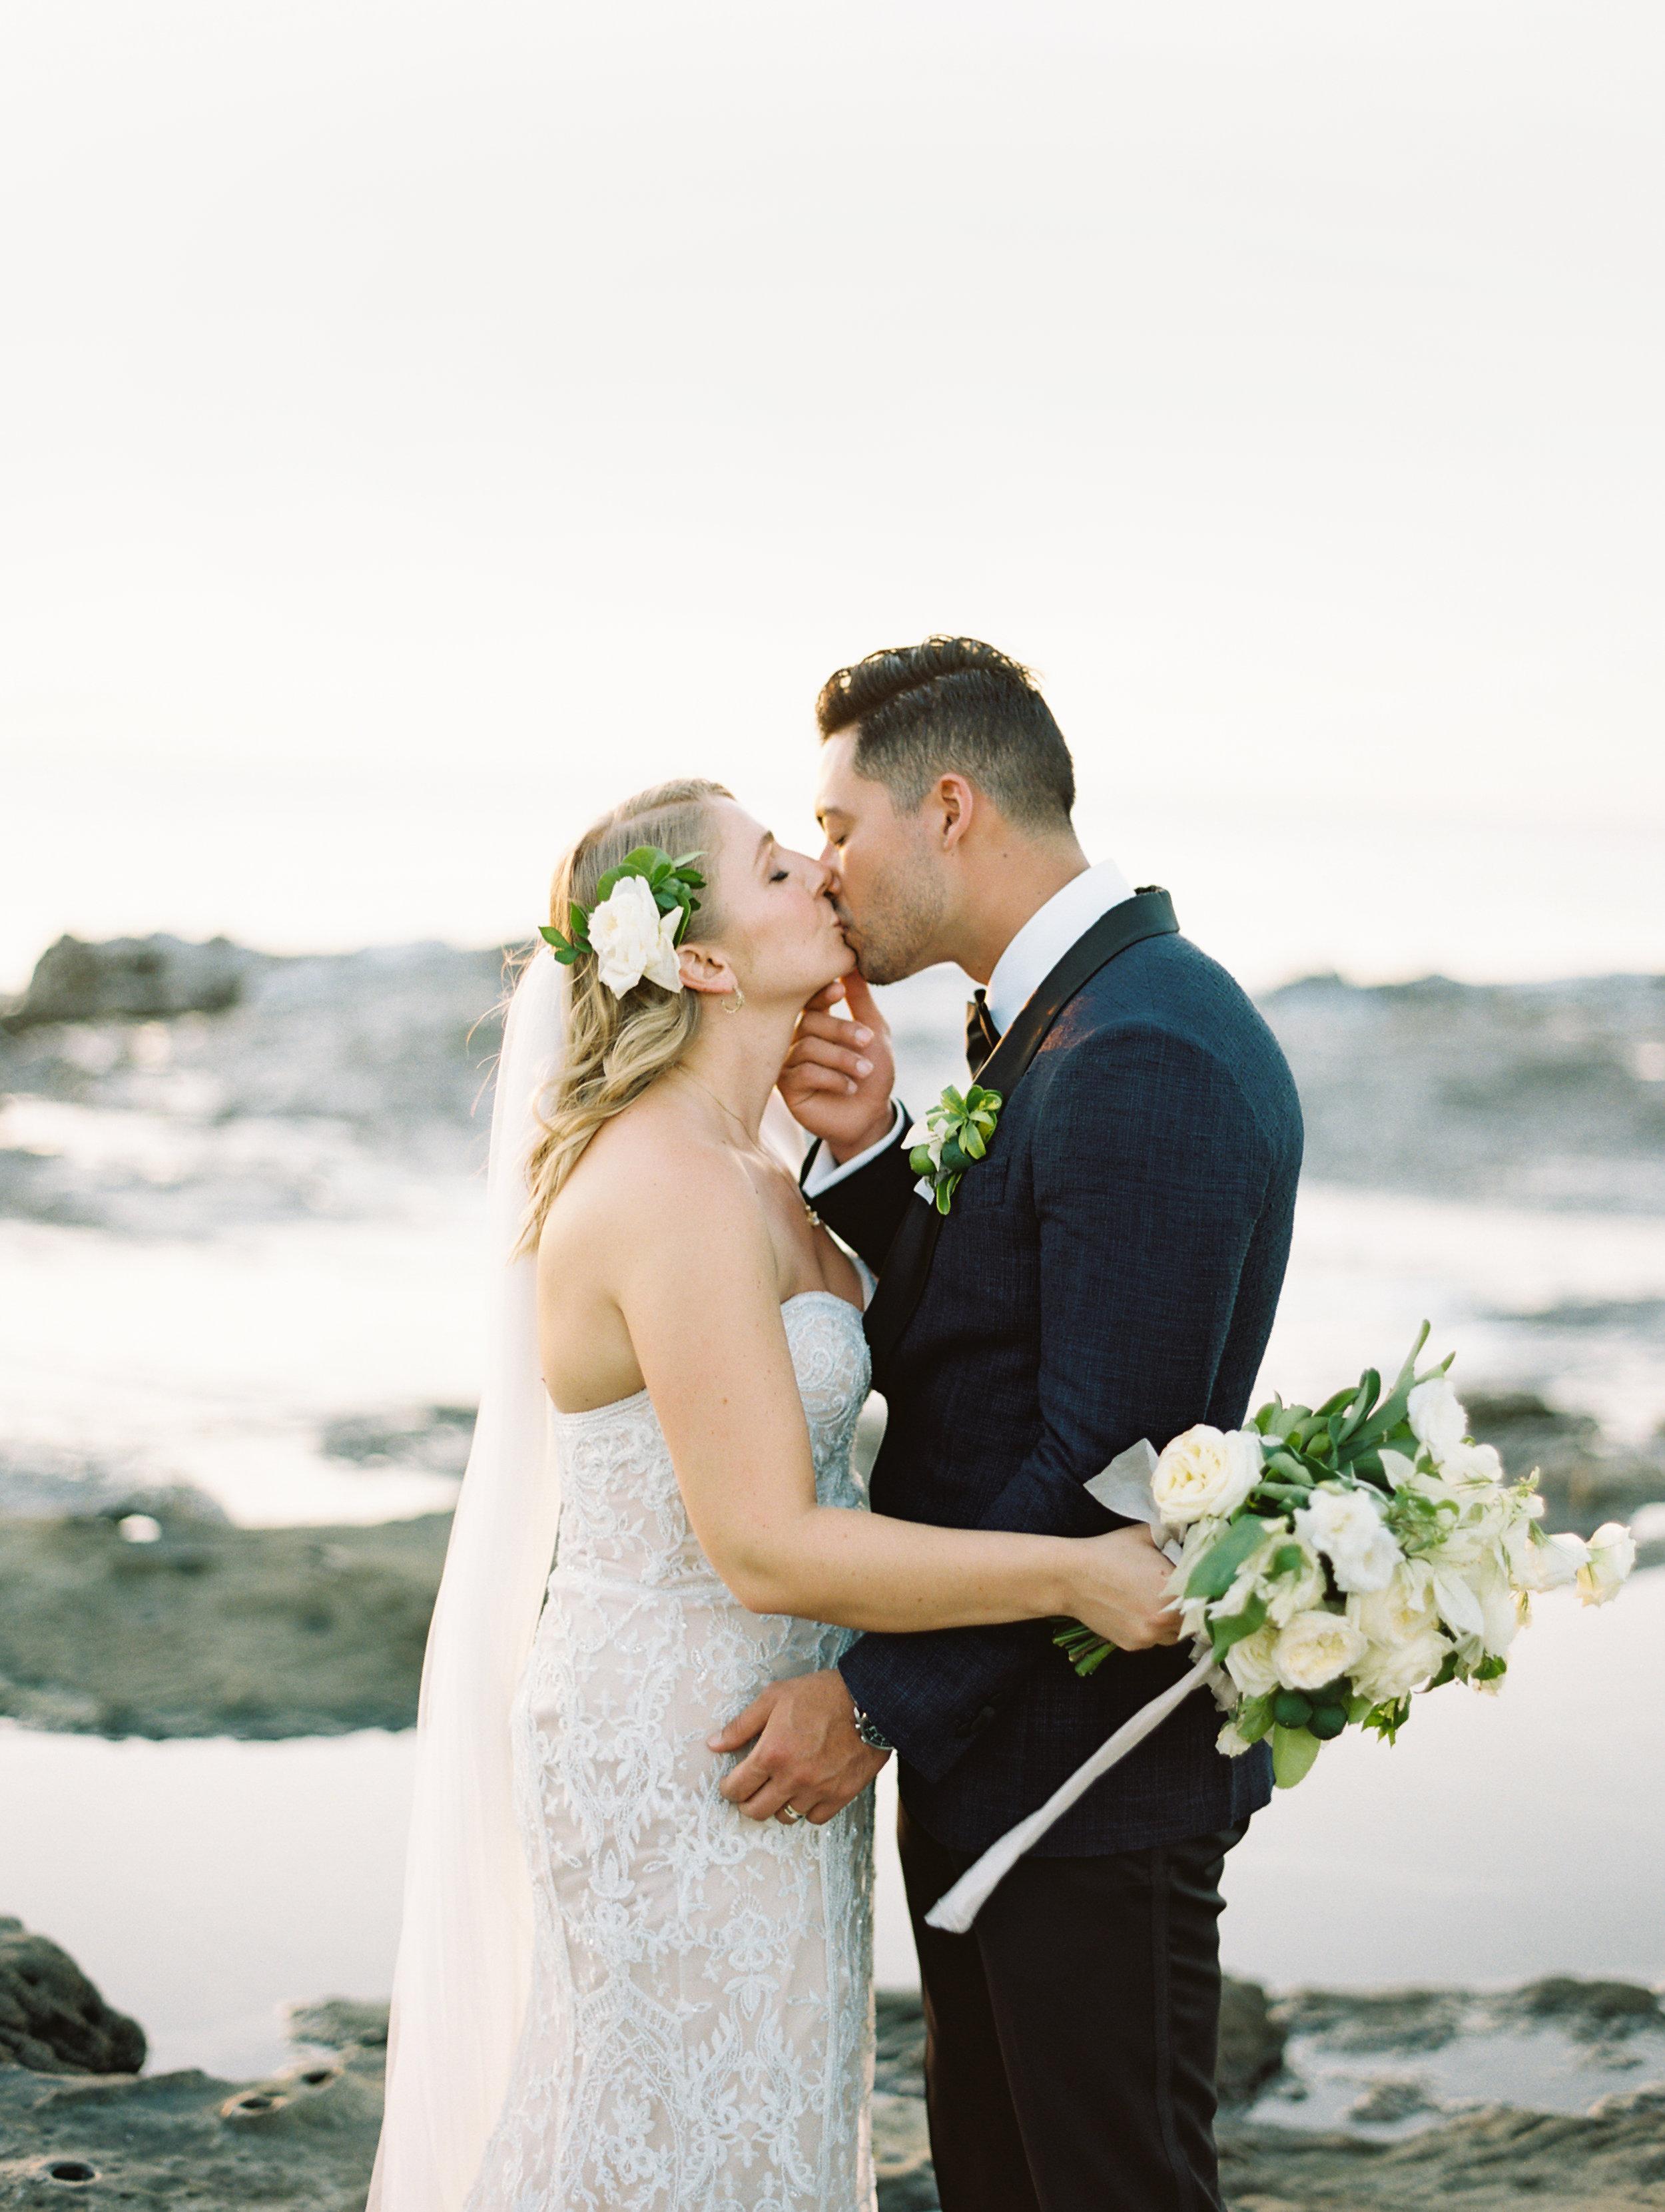 482-fine-art-film-photographer-destination-wedding-nicaragua-jacob+cammye-brumley & wells.jpg